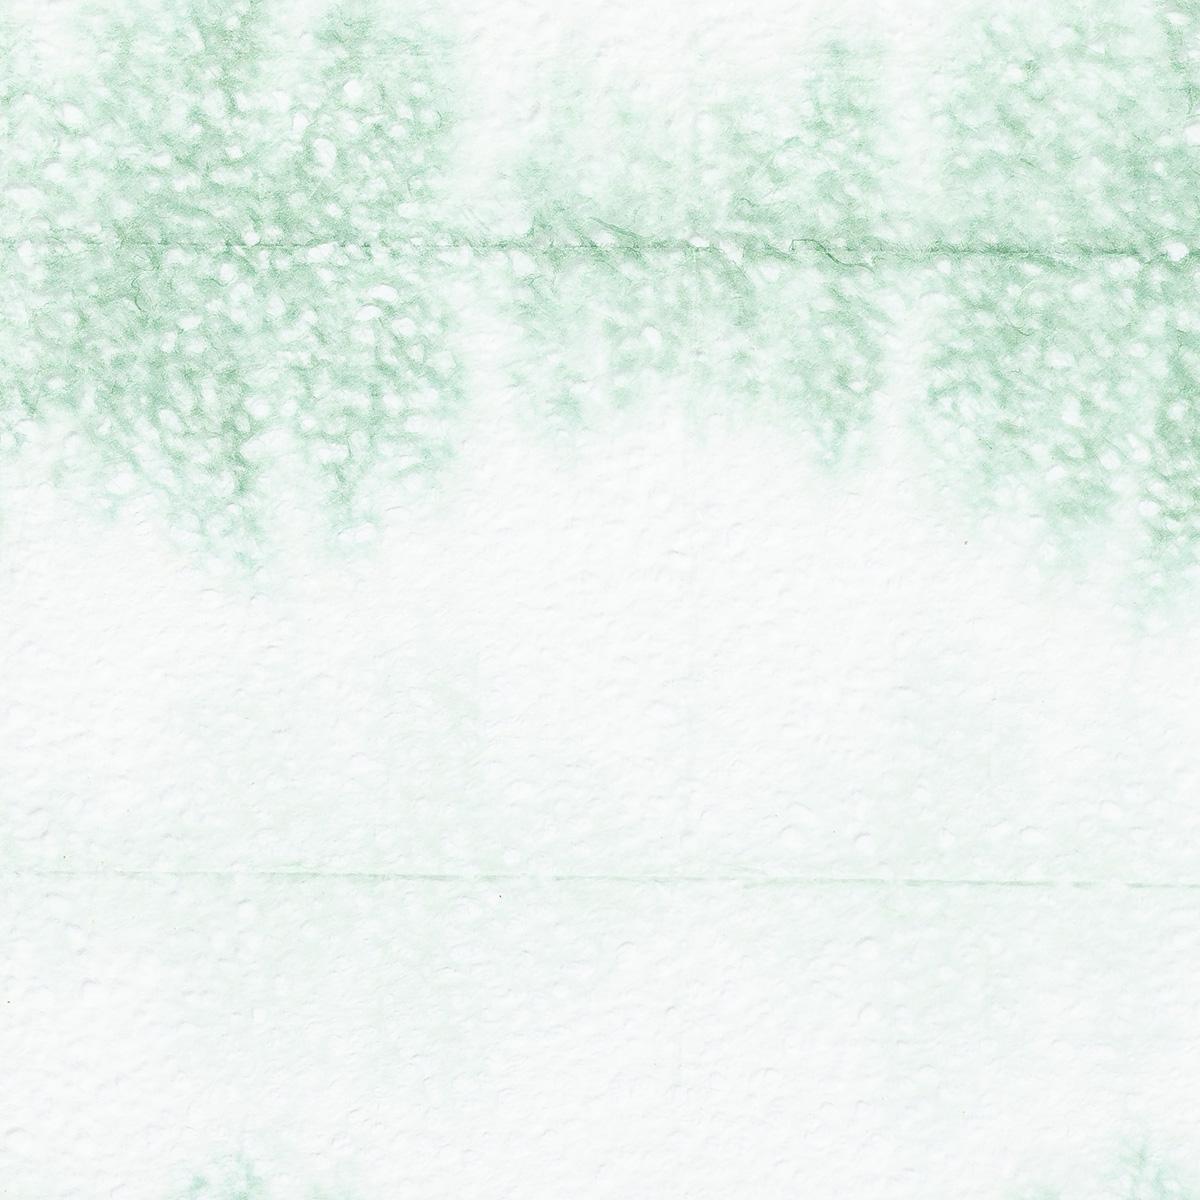 落水紙(春雨)板締め No.17